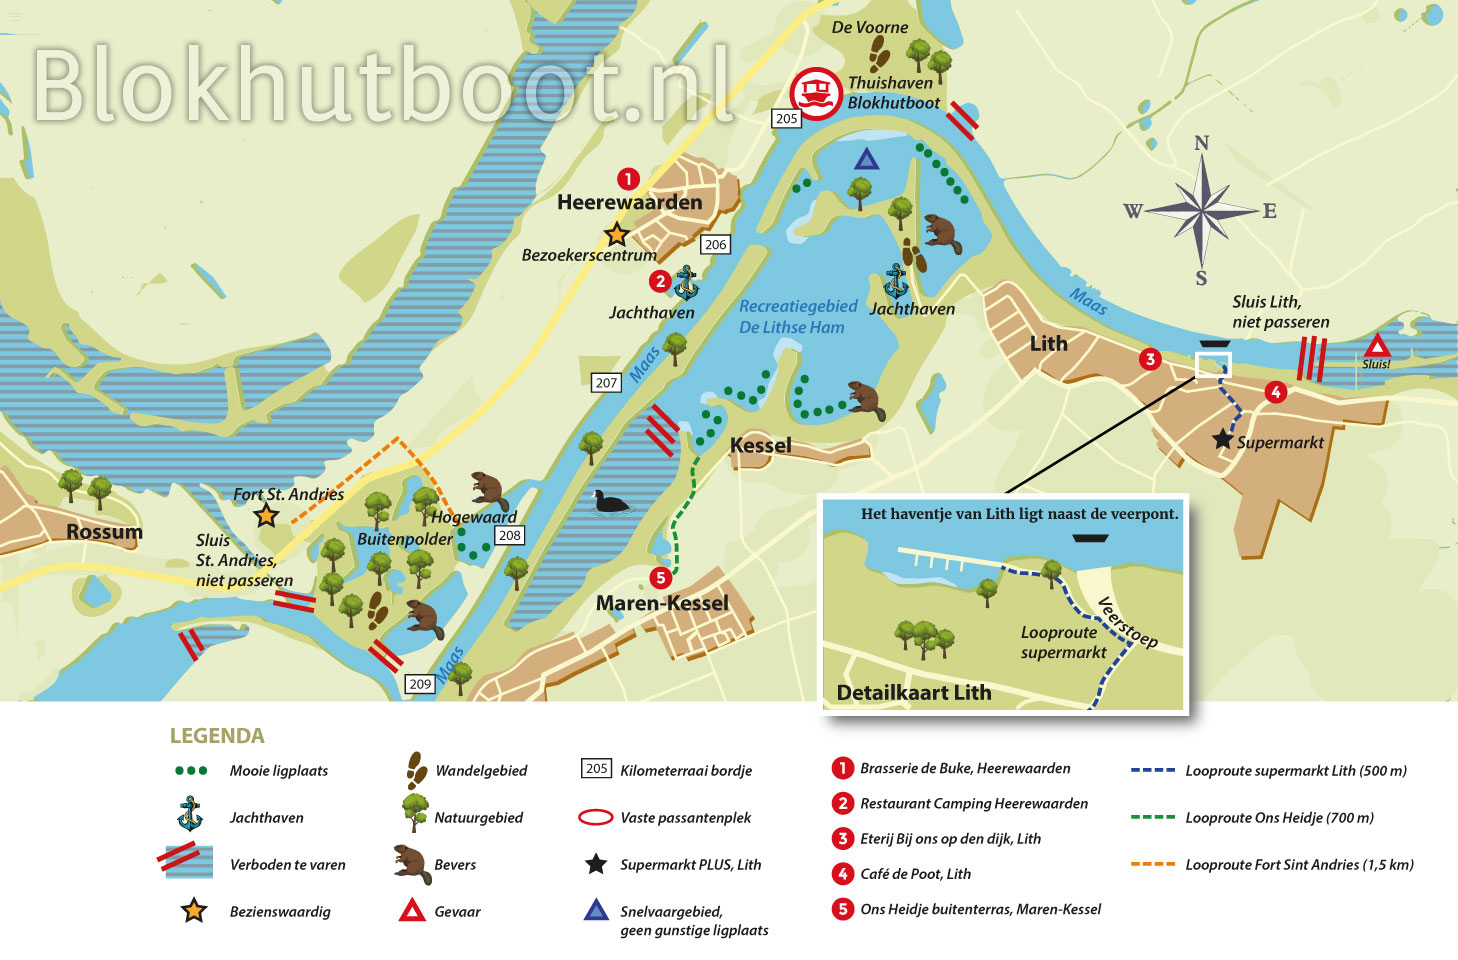 Kaart Blokhutboot, Lithse Ham